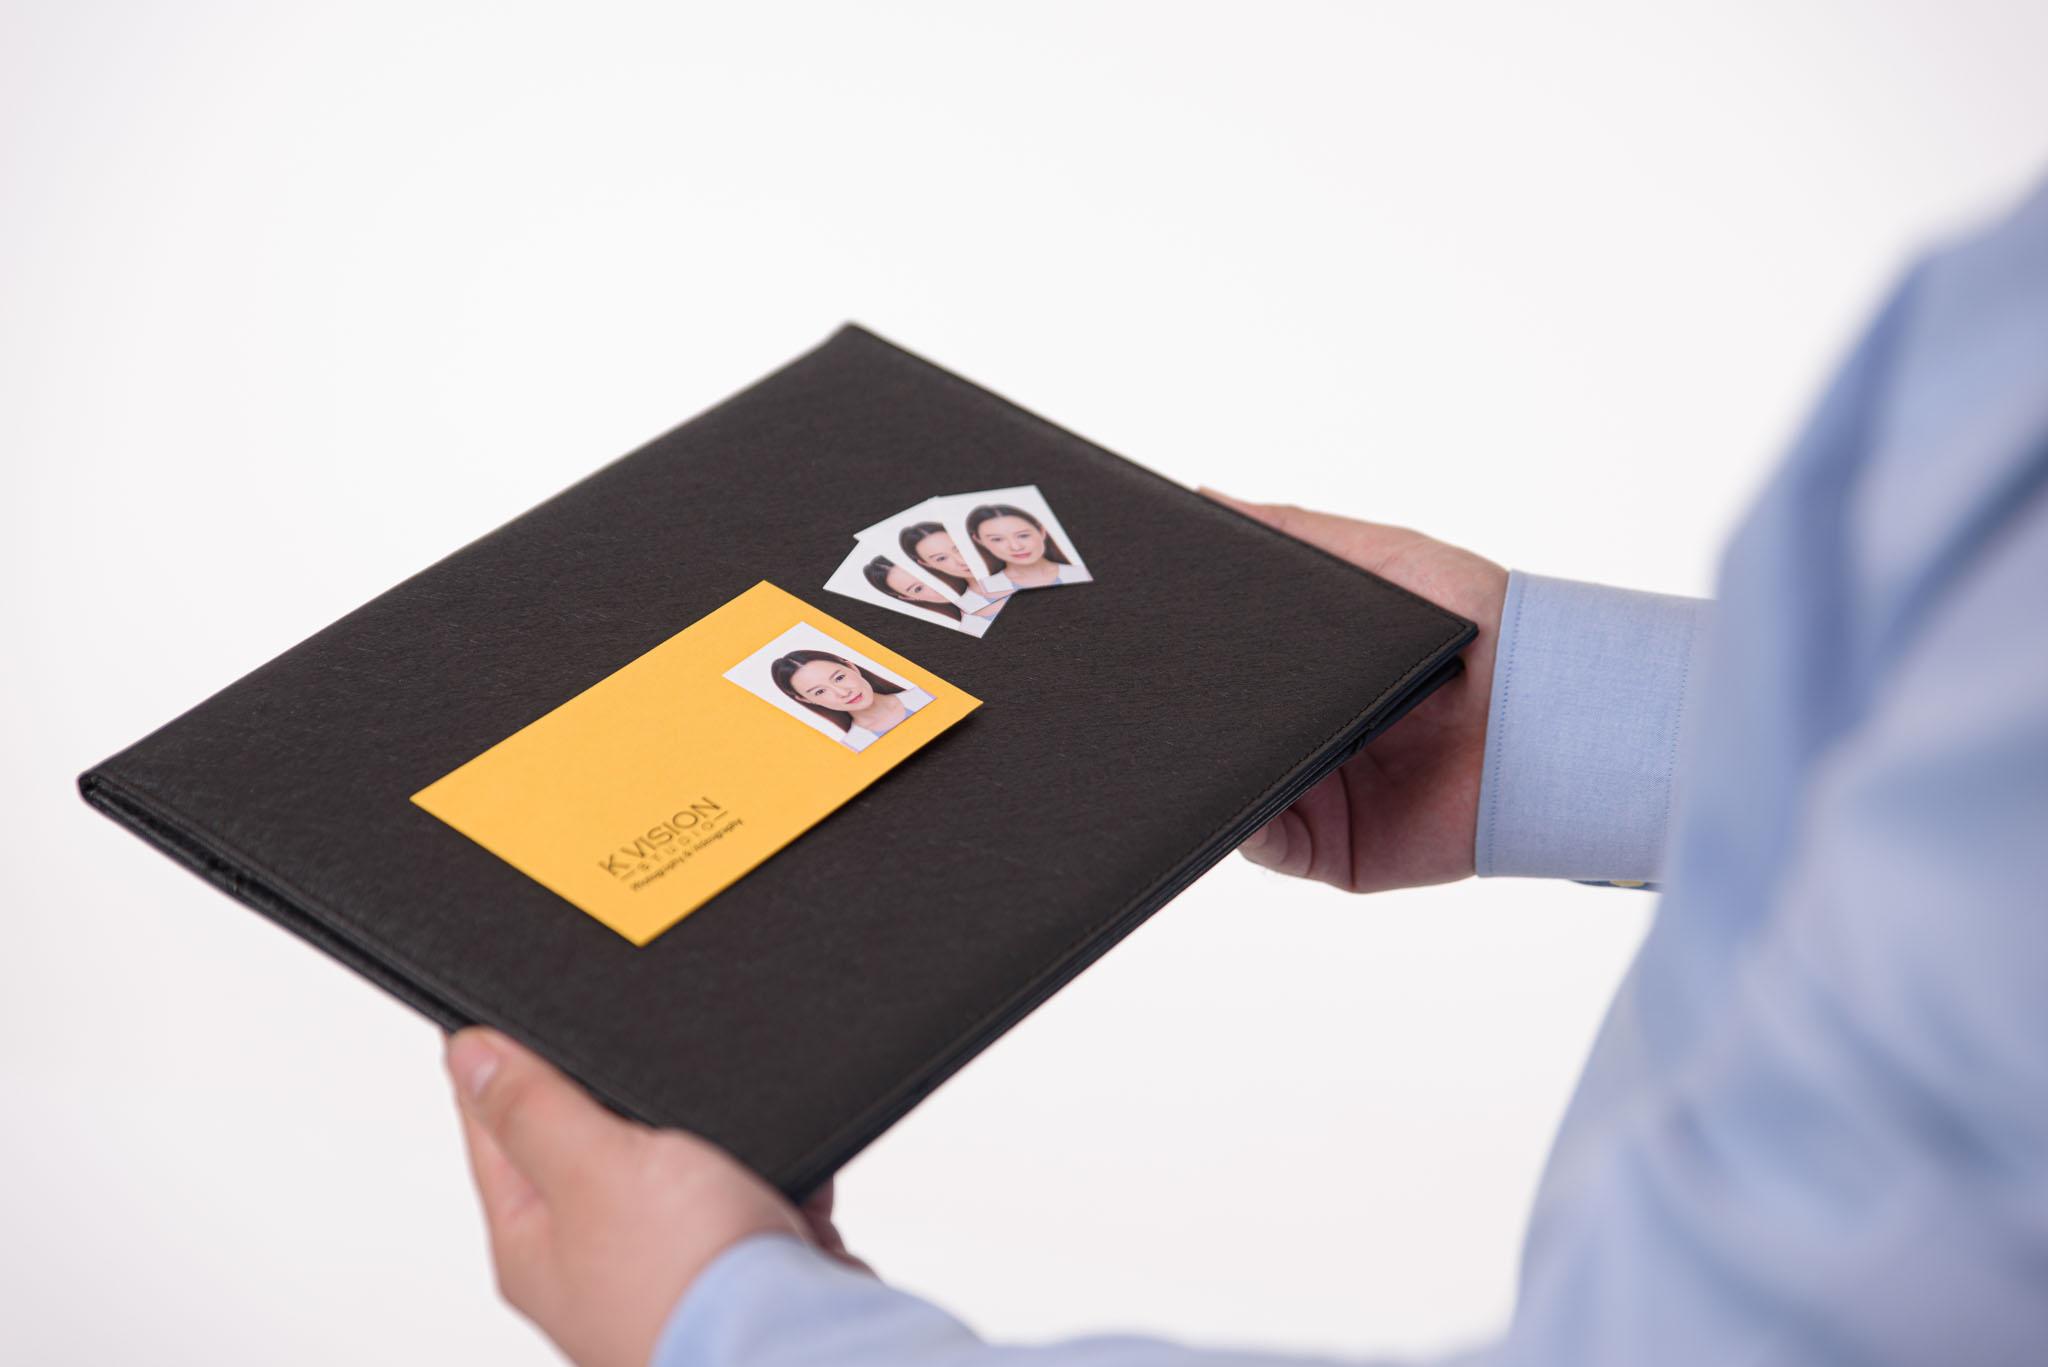 Passport photo delivery